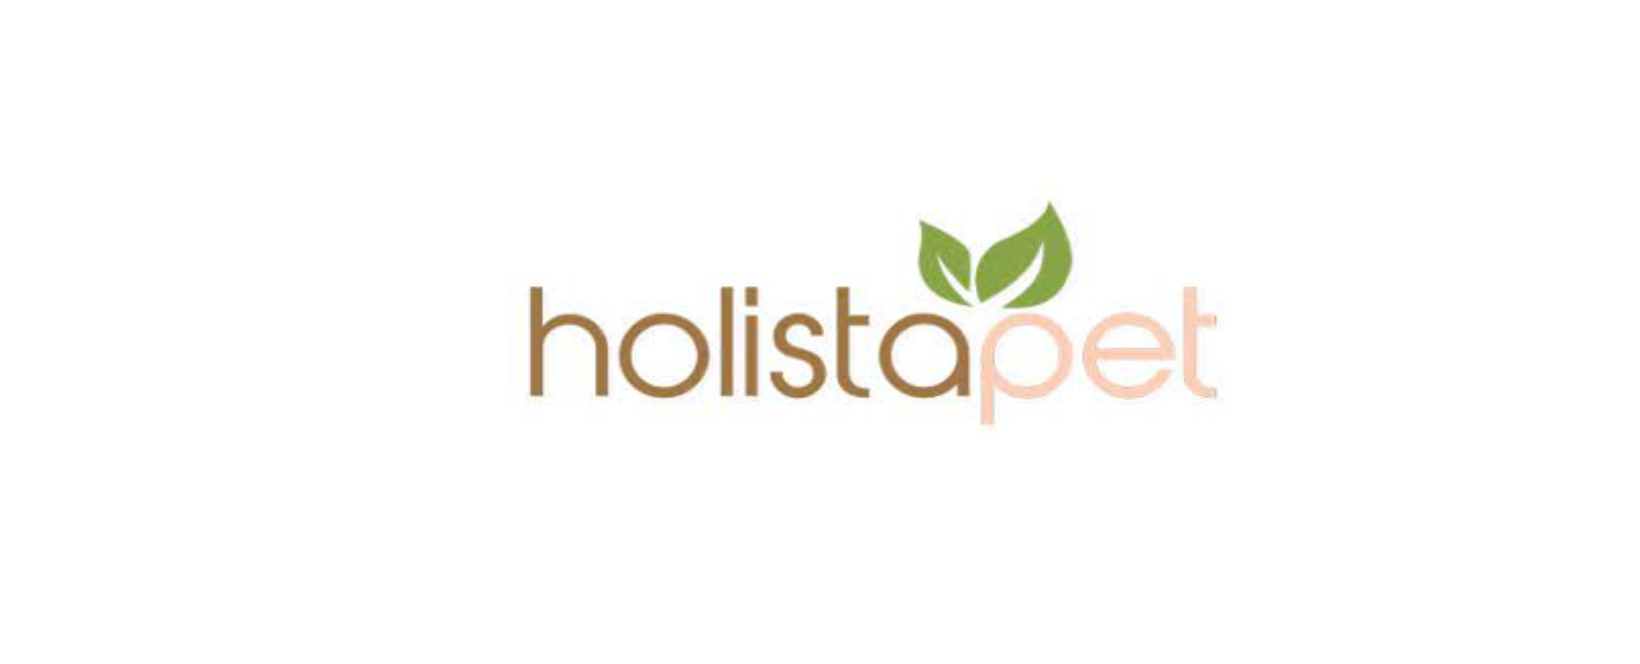 HolistaPet Discount Code 2021